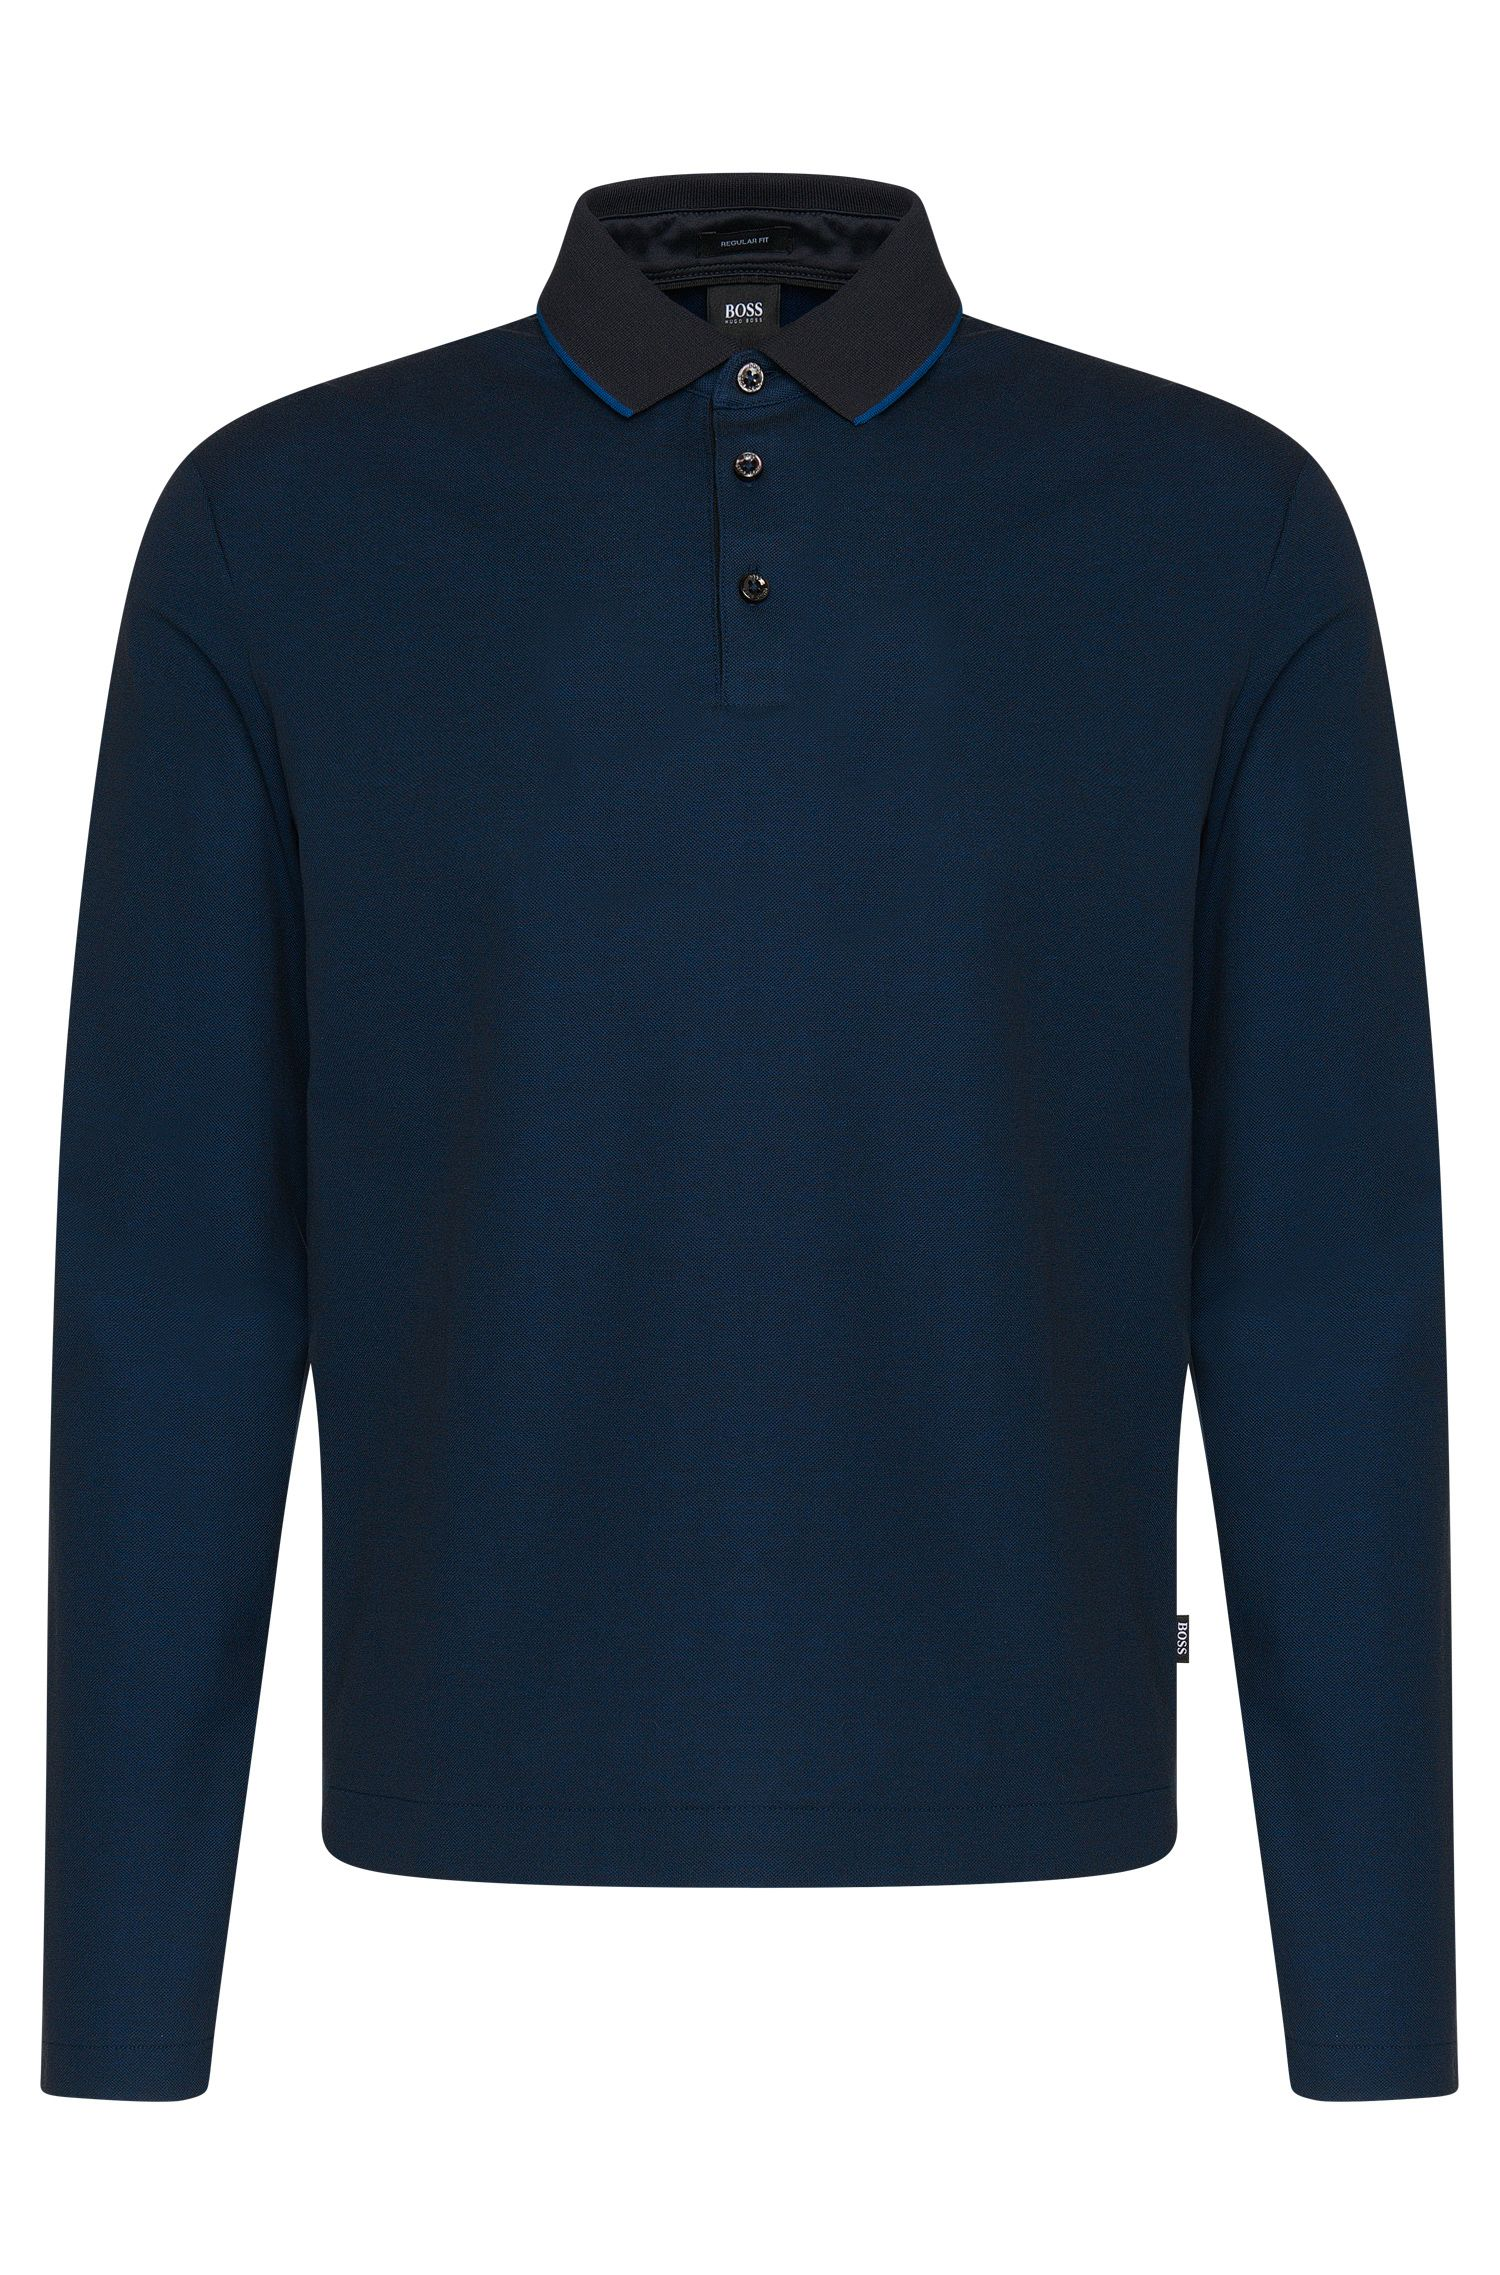 'Pado' | Regular Fit, Cotton Pique Polo